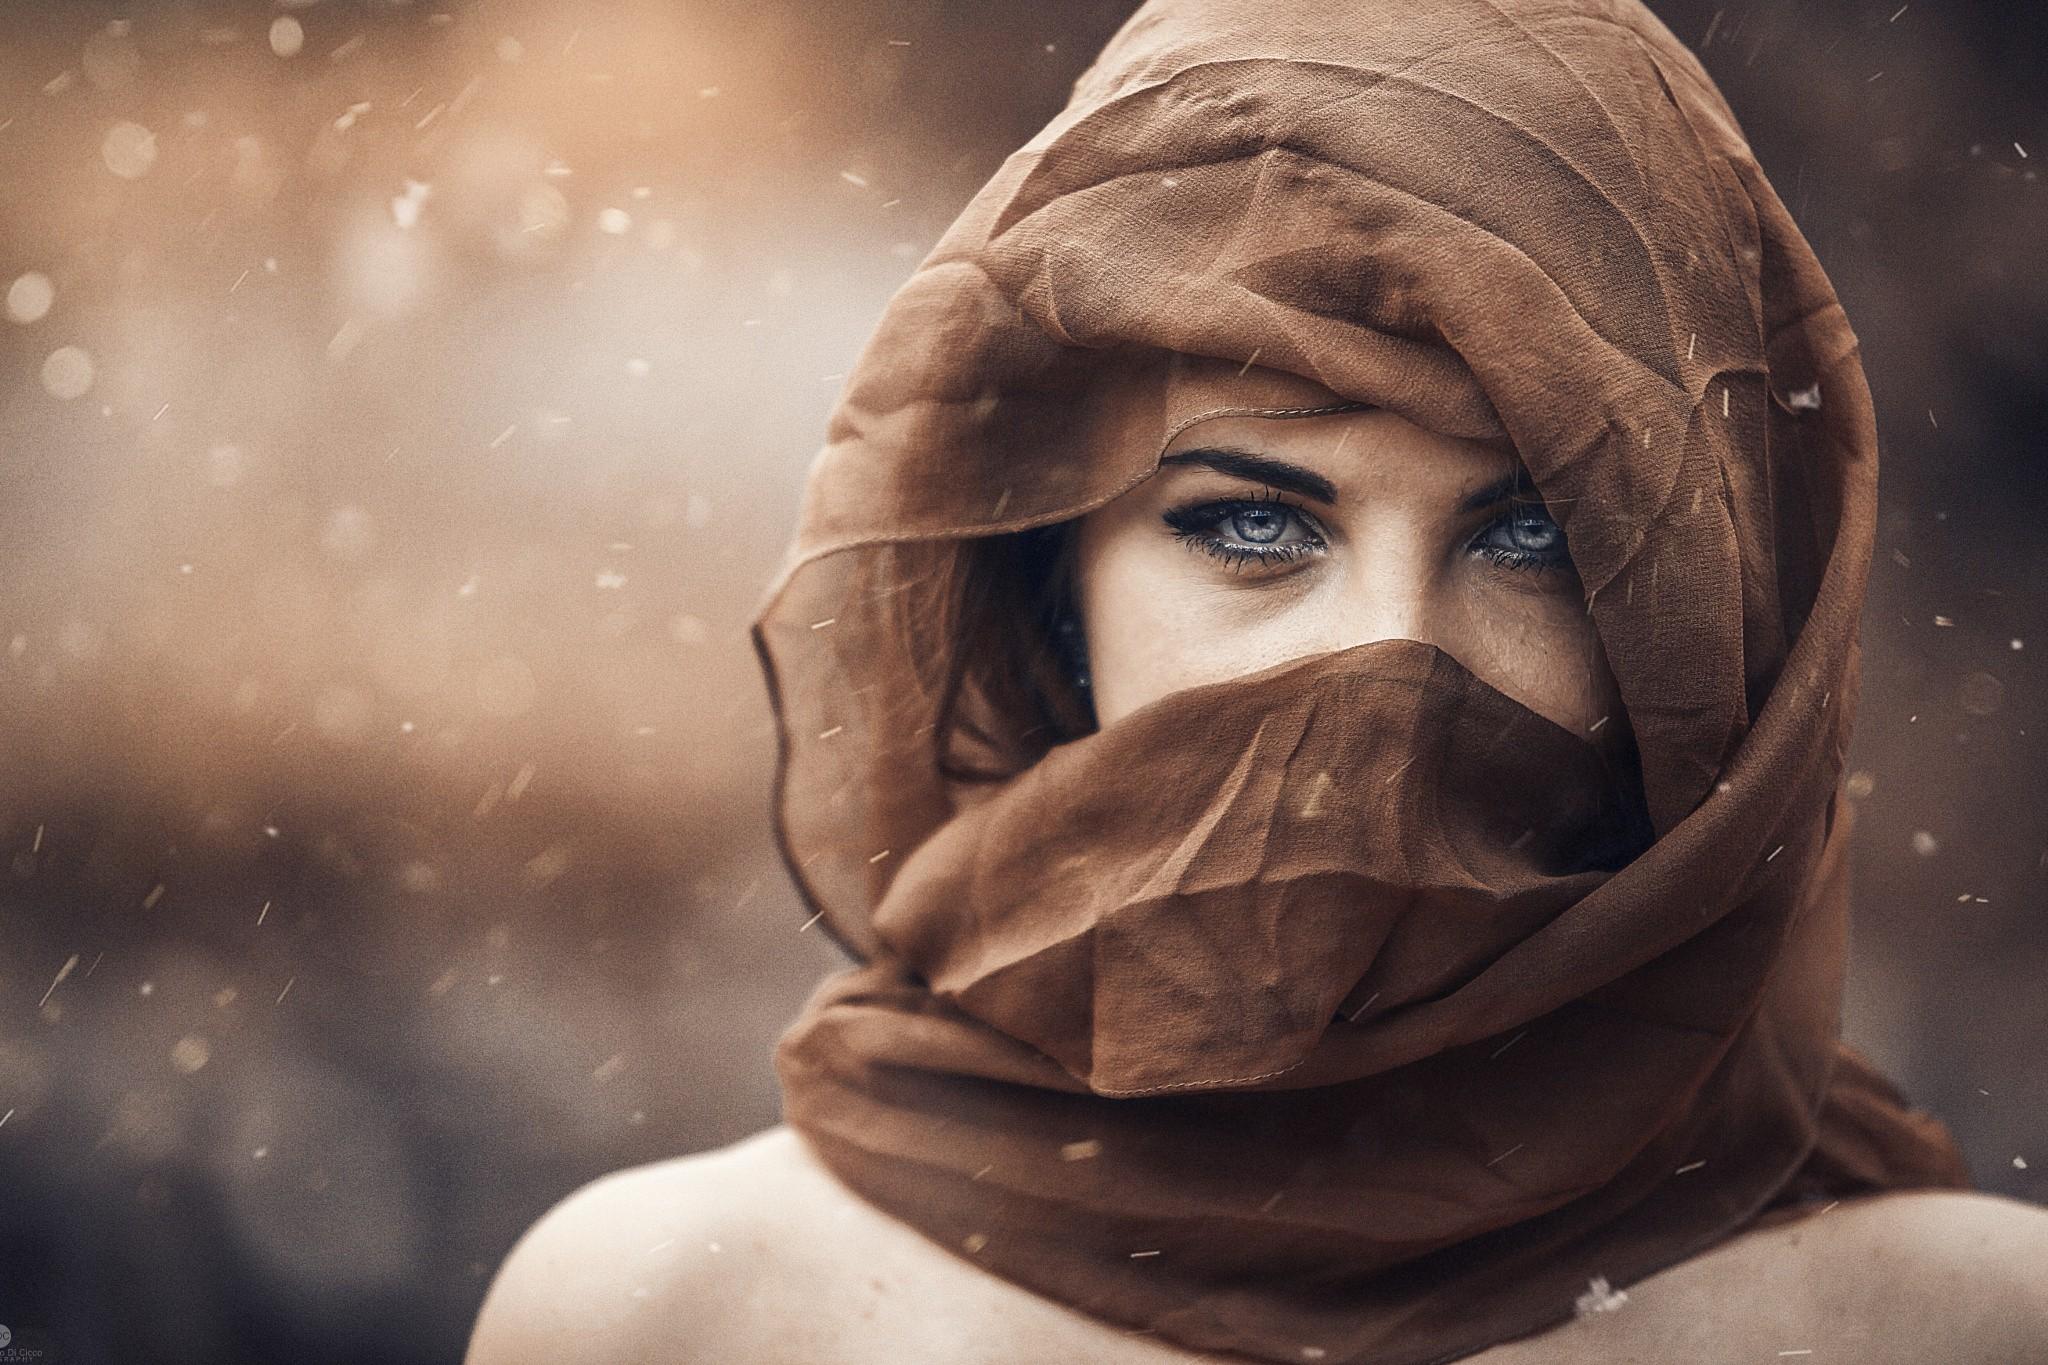 People 2048x1365 women model looking at viewer sensual gaze brunette scarf blue eyes